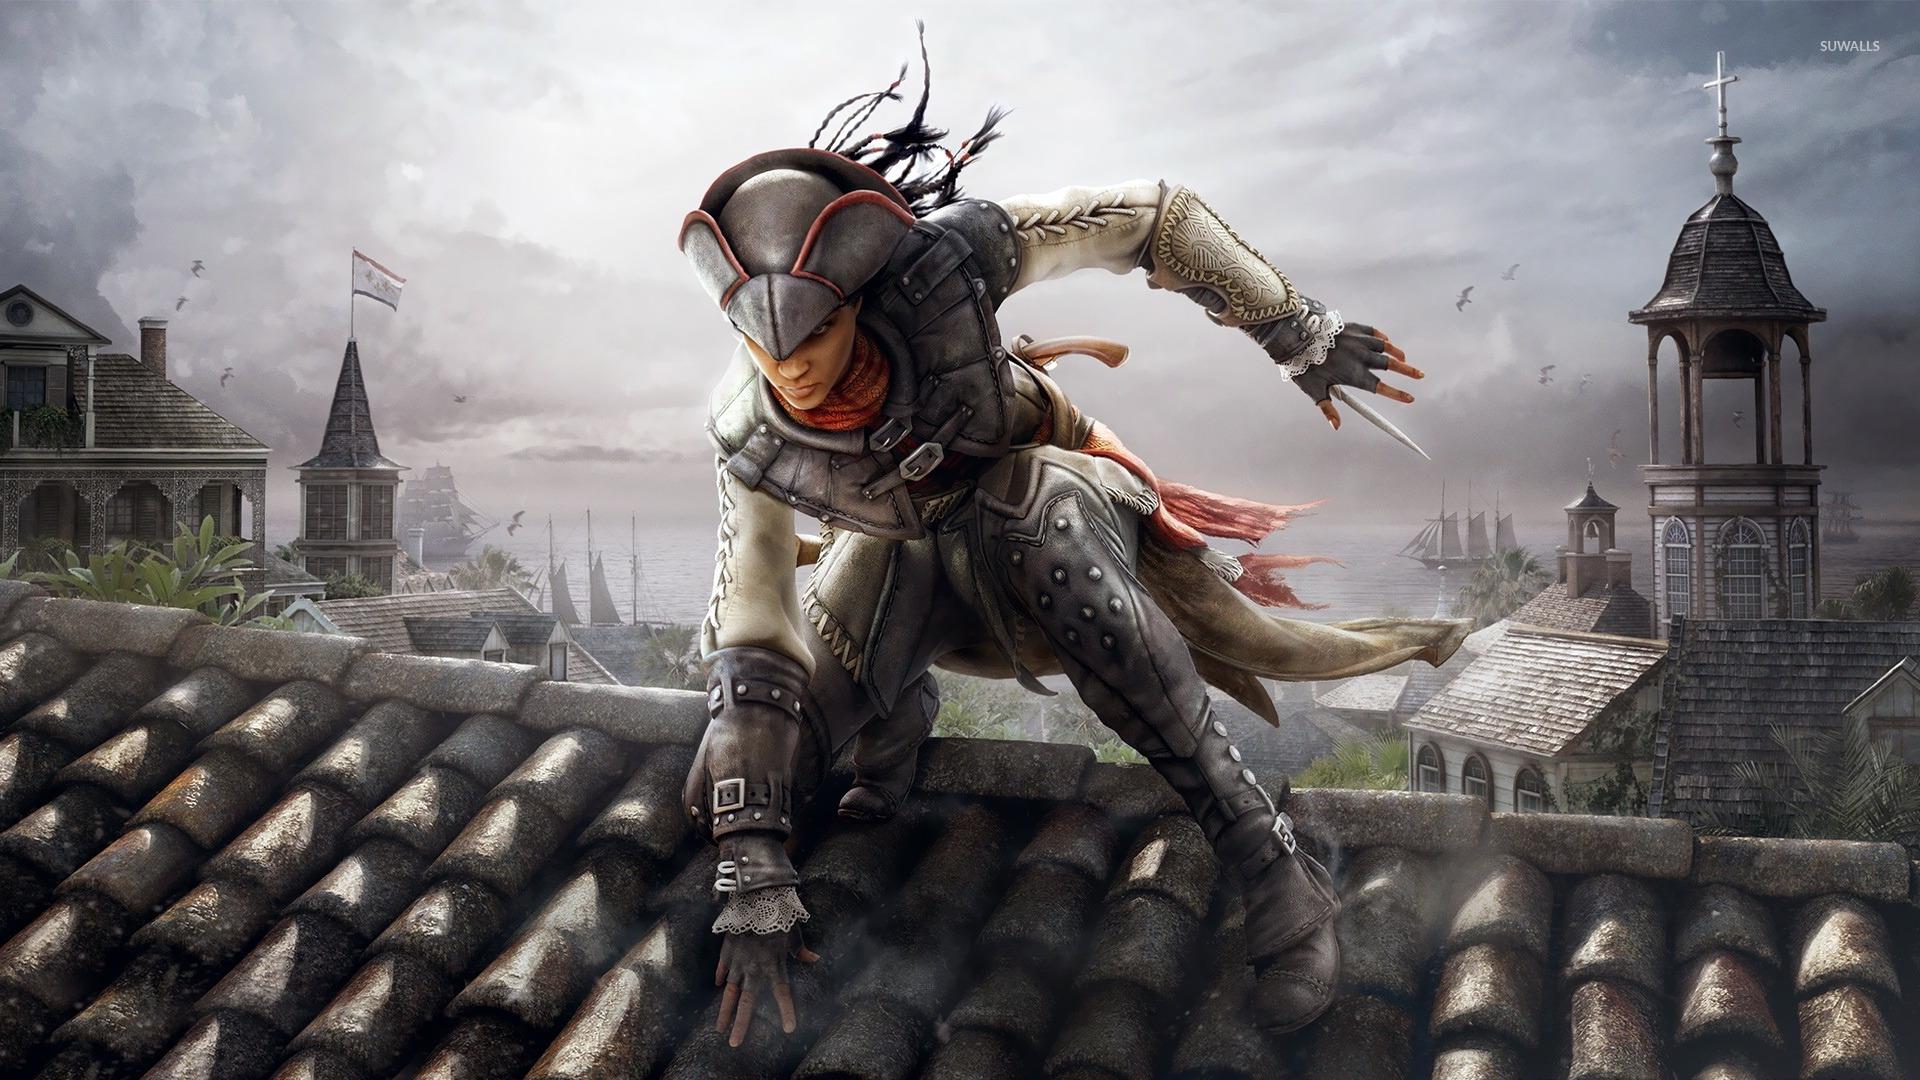 Assassins Creed 4 Multiplayer Femlae wallpaper 1920x1080